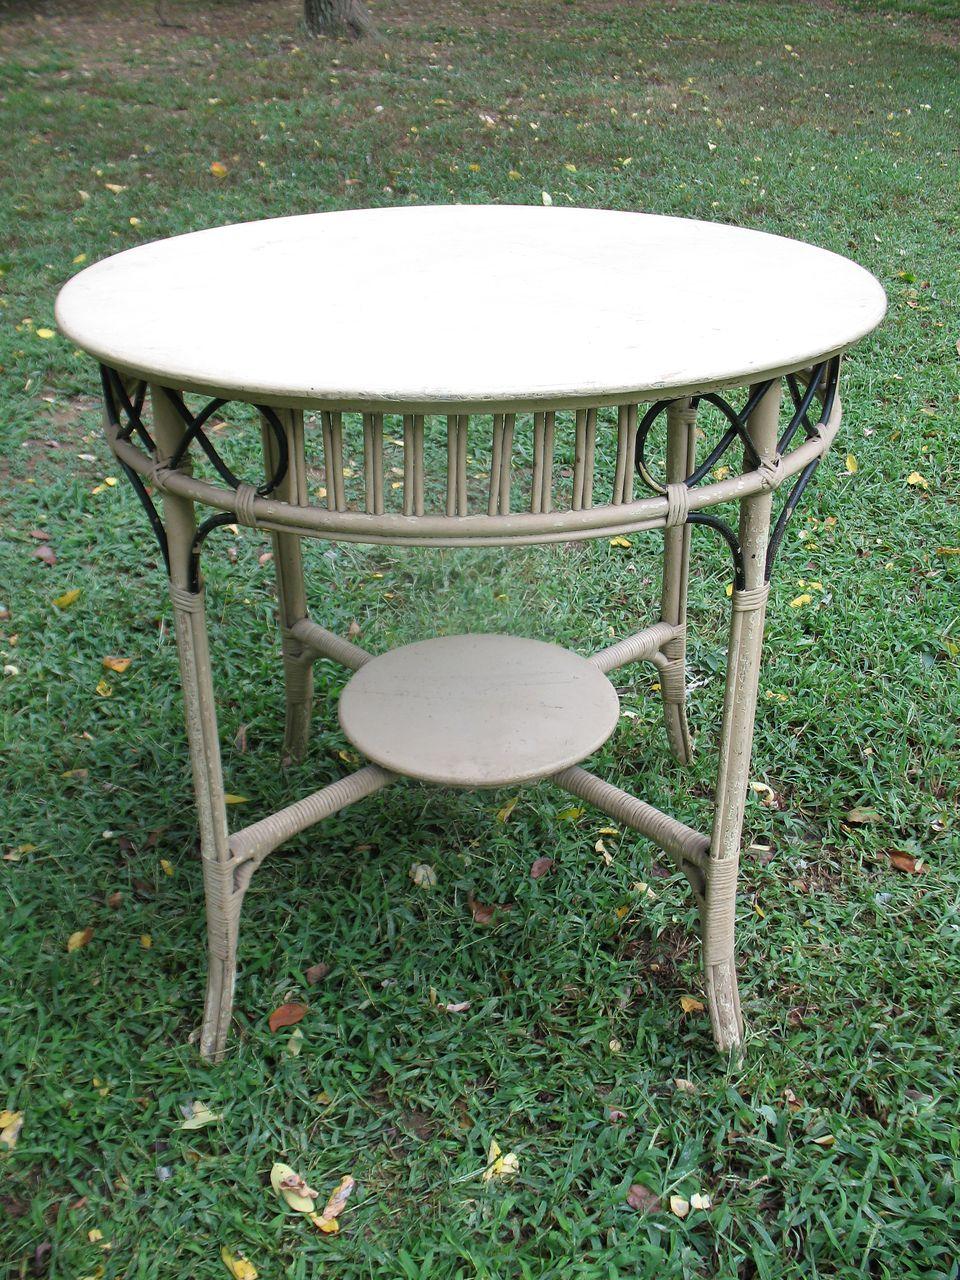 Antique Wicker Desk Ideas - Antique Wicker Table - Best 2000+ Antique Decor Ideas